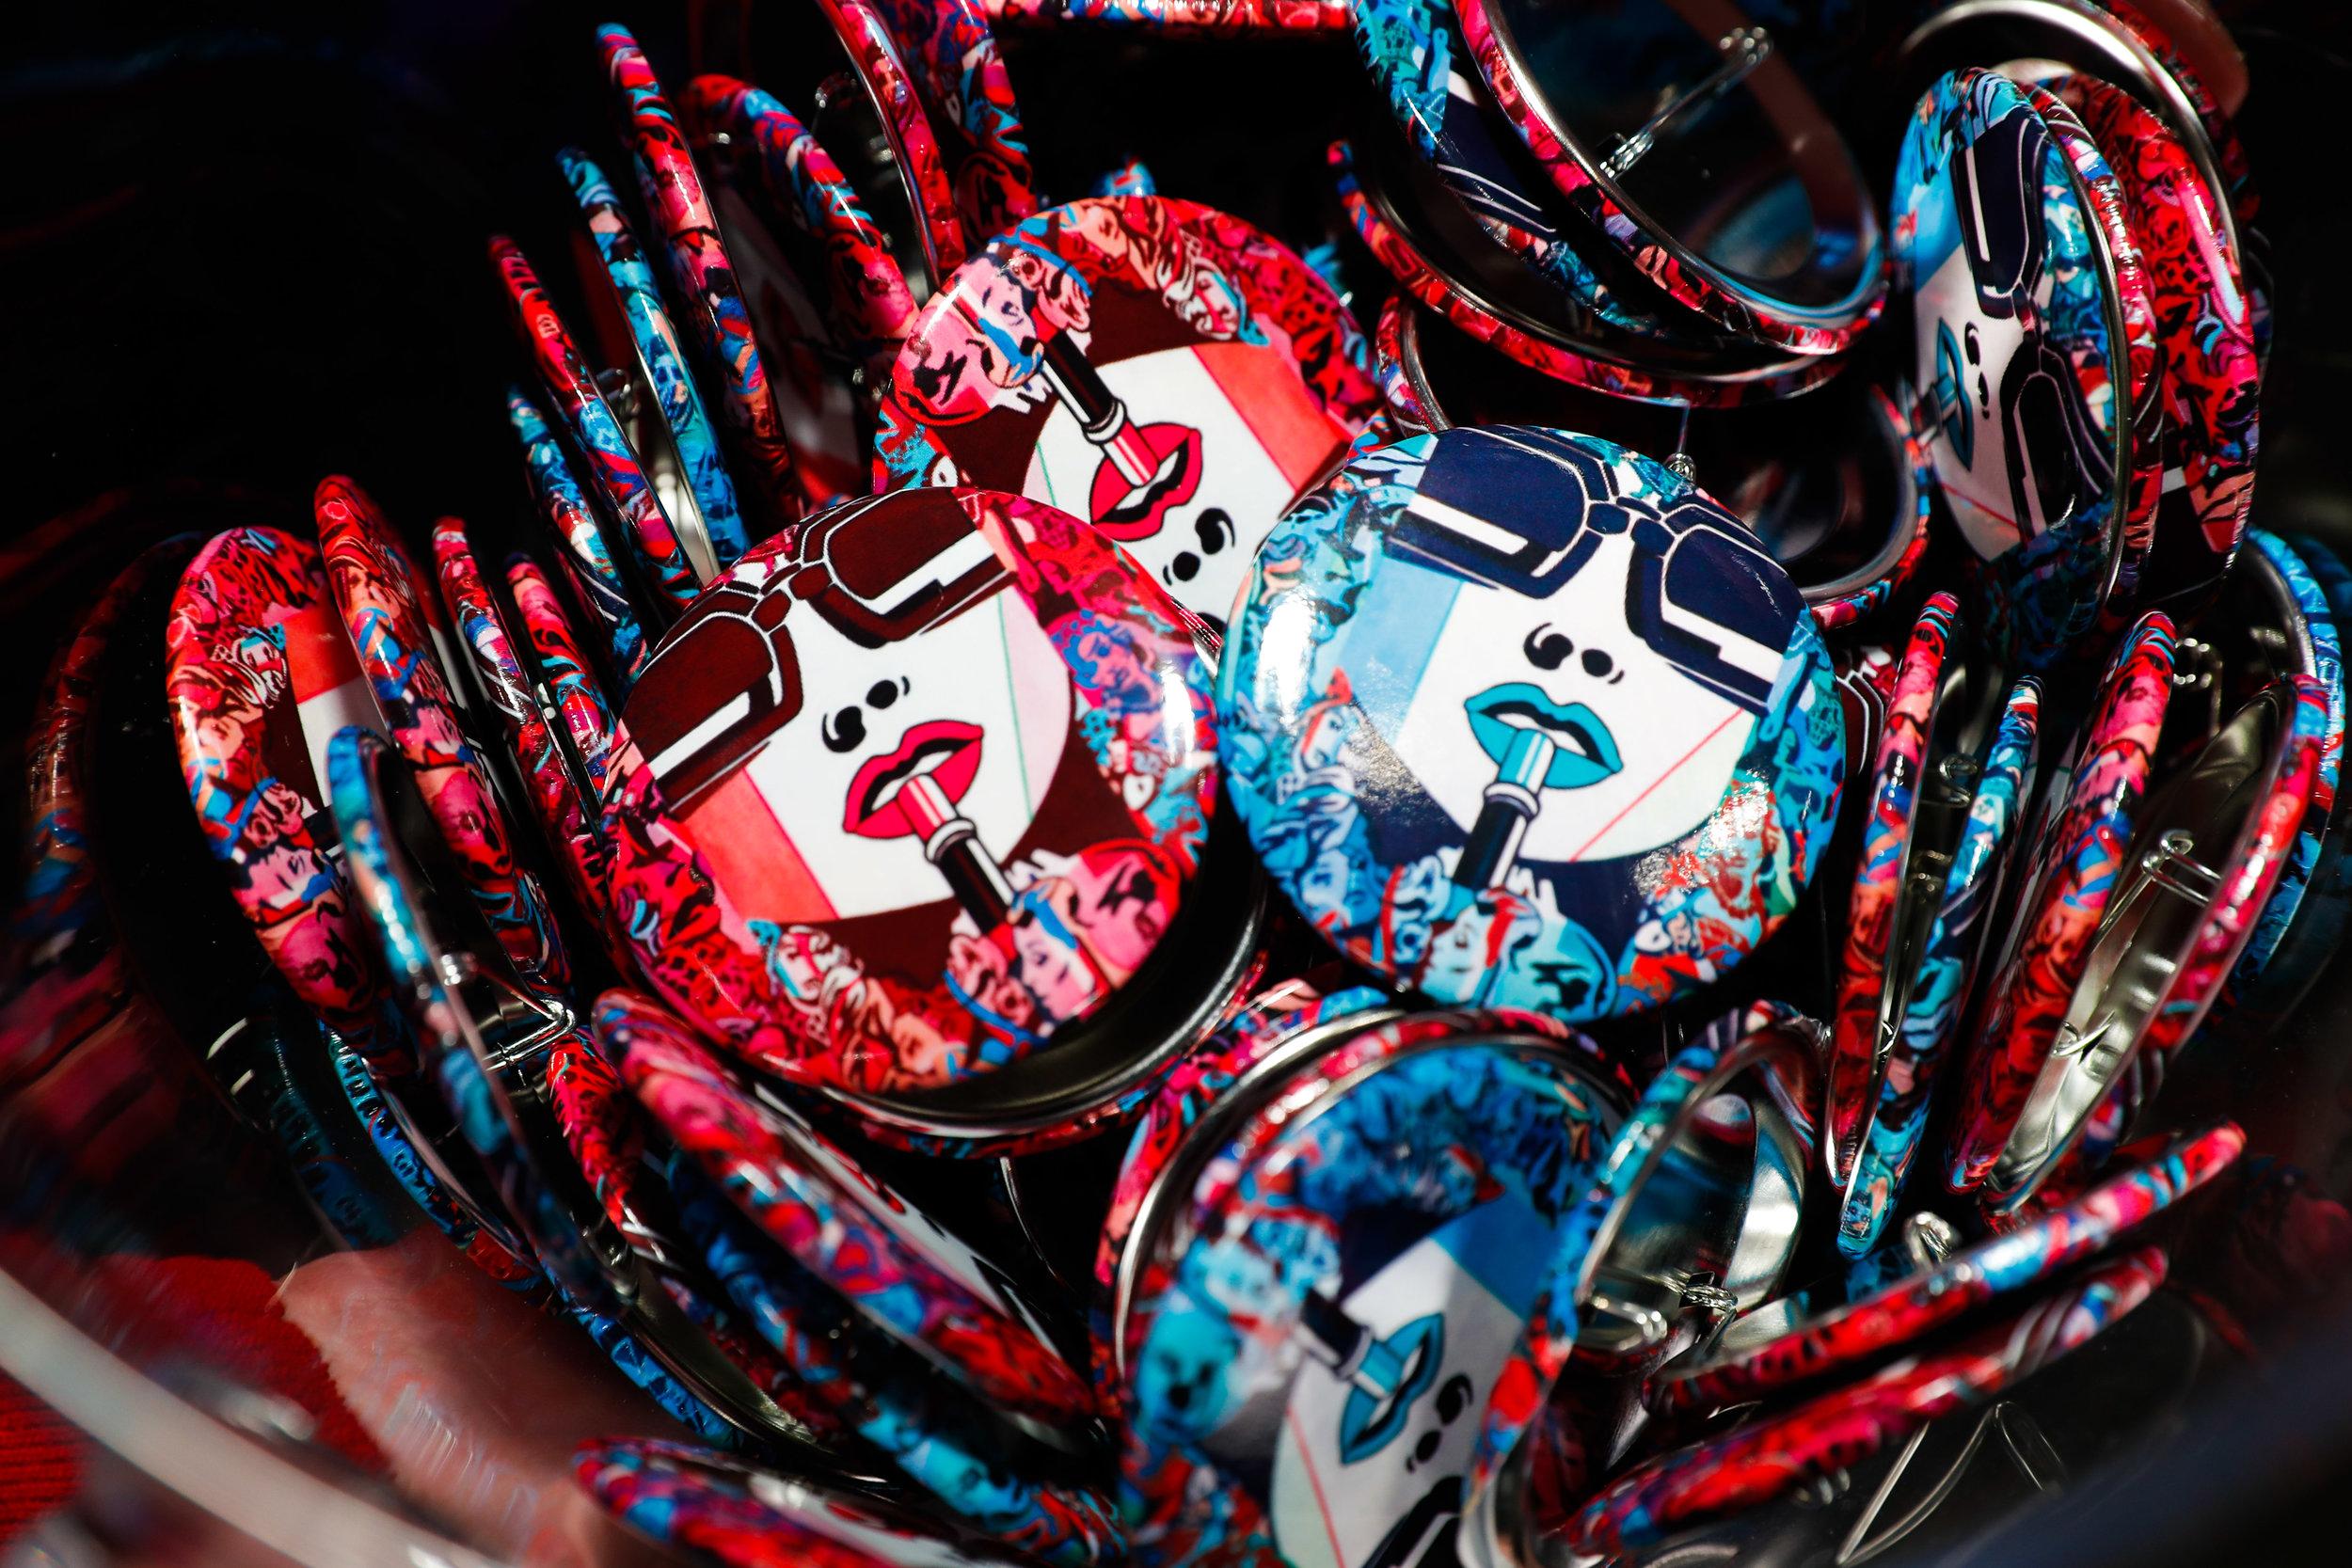 HUBLOT NYC MARC FERRERO7973-FHR.jpg